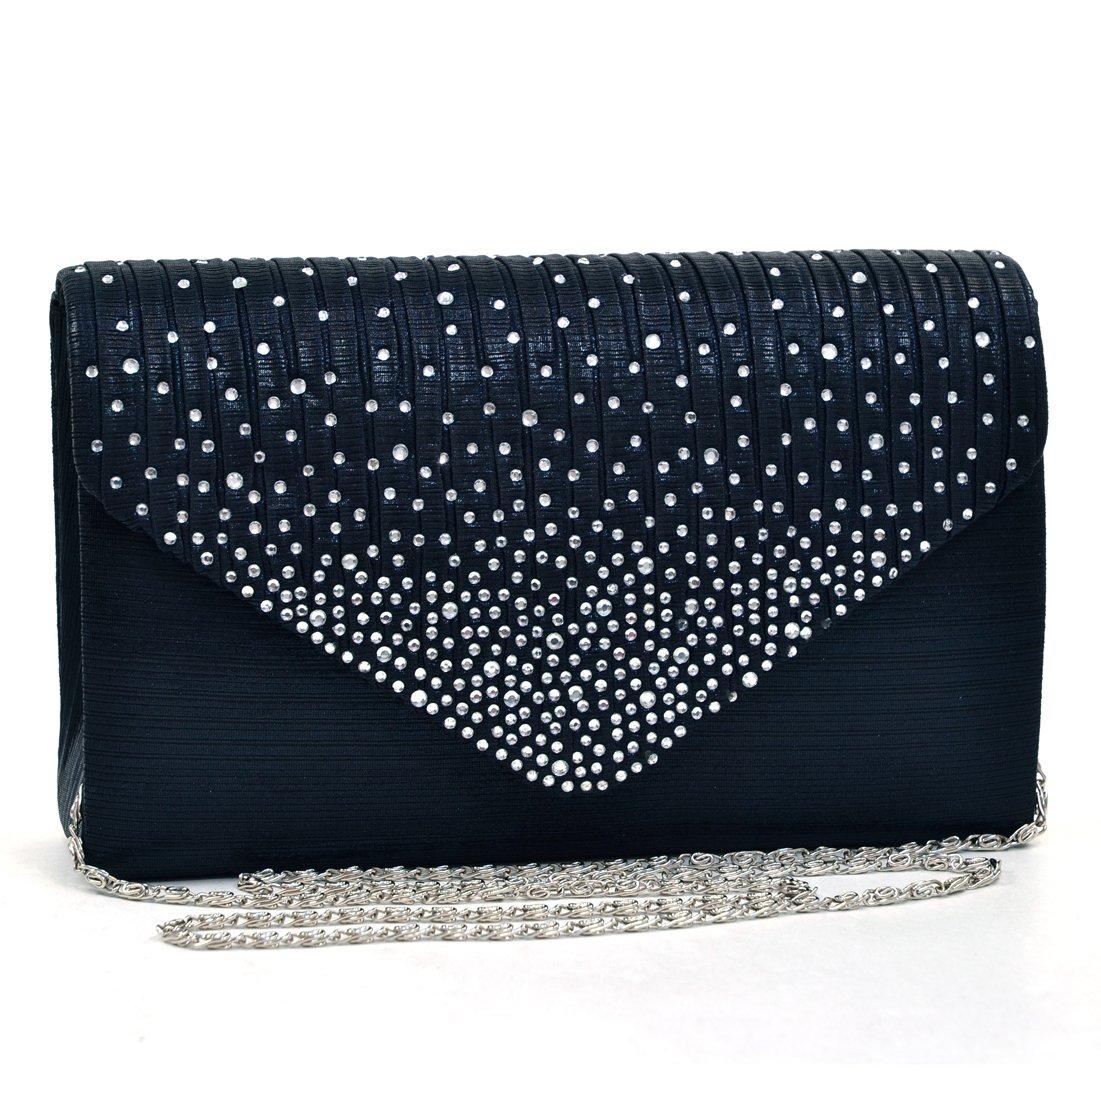 Womens Envelope Flap Clutch Handbag Evening Bag Purse Rhinestone Crystal Glitter Sequin Party Black